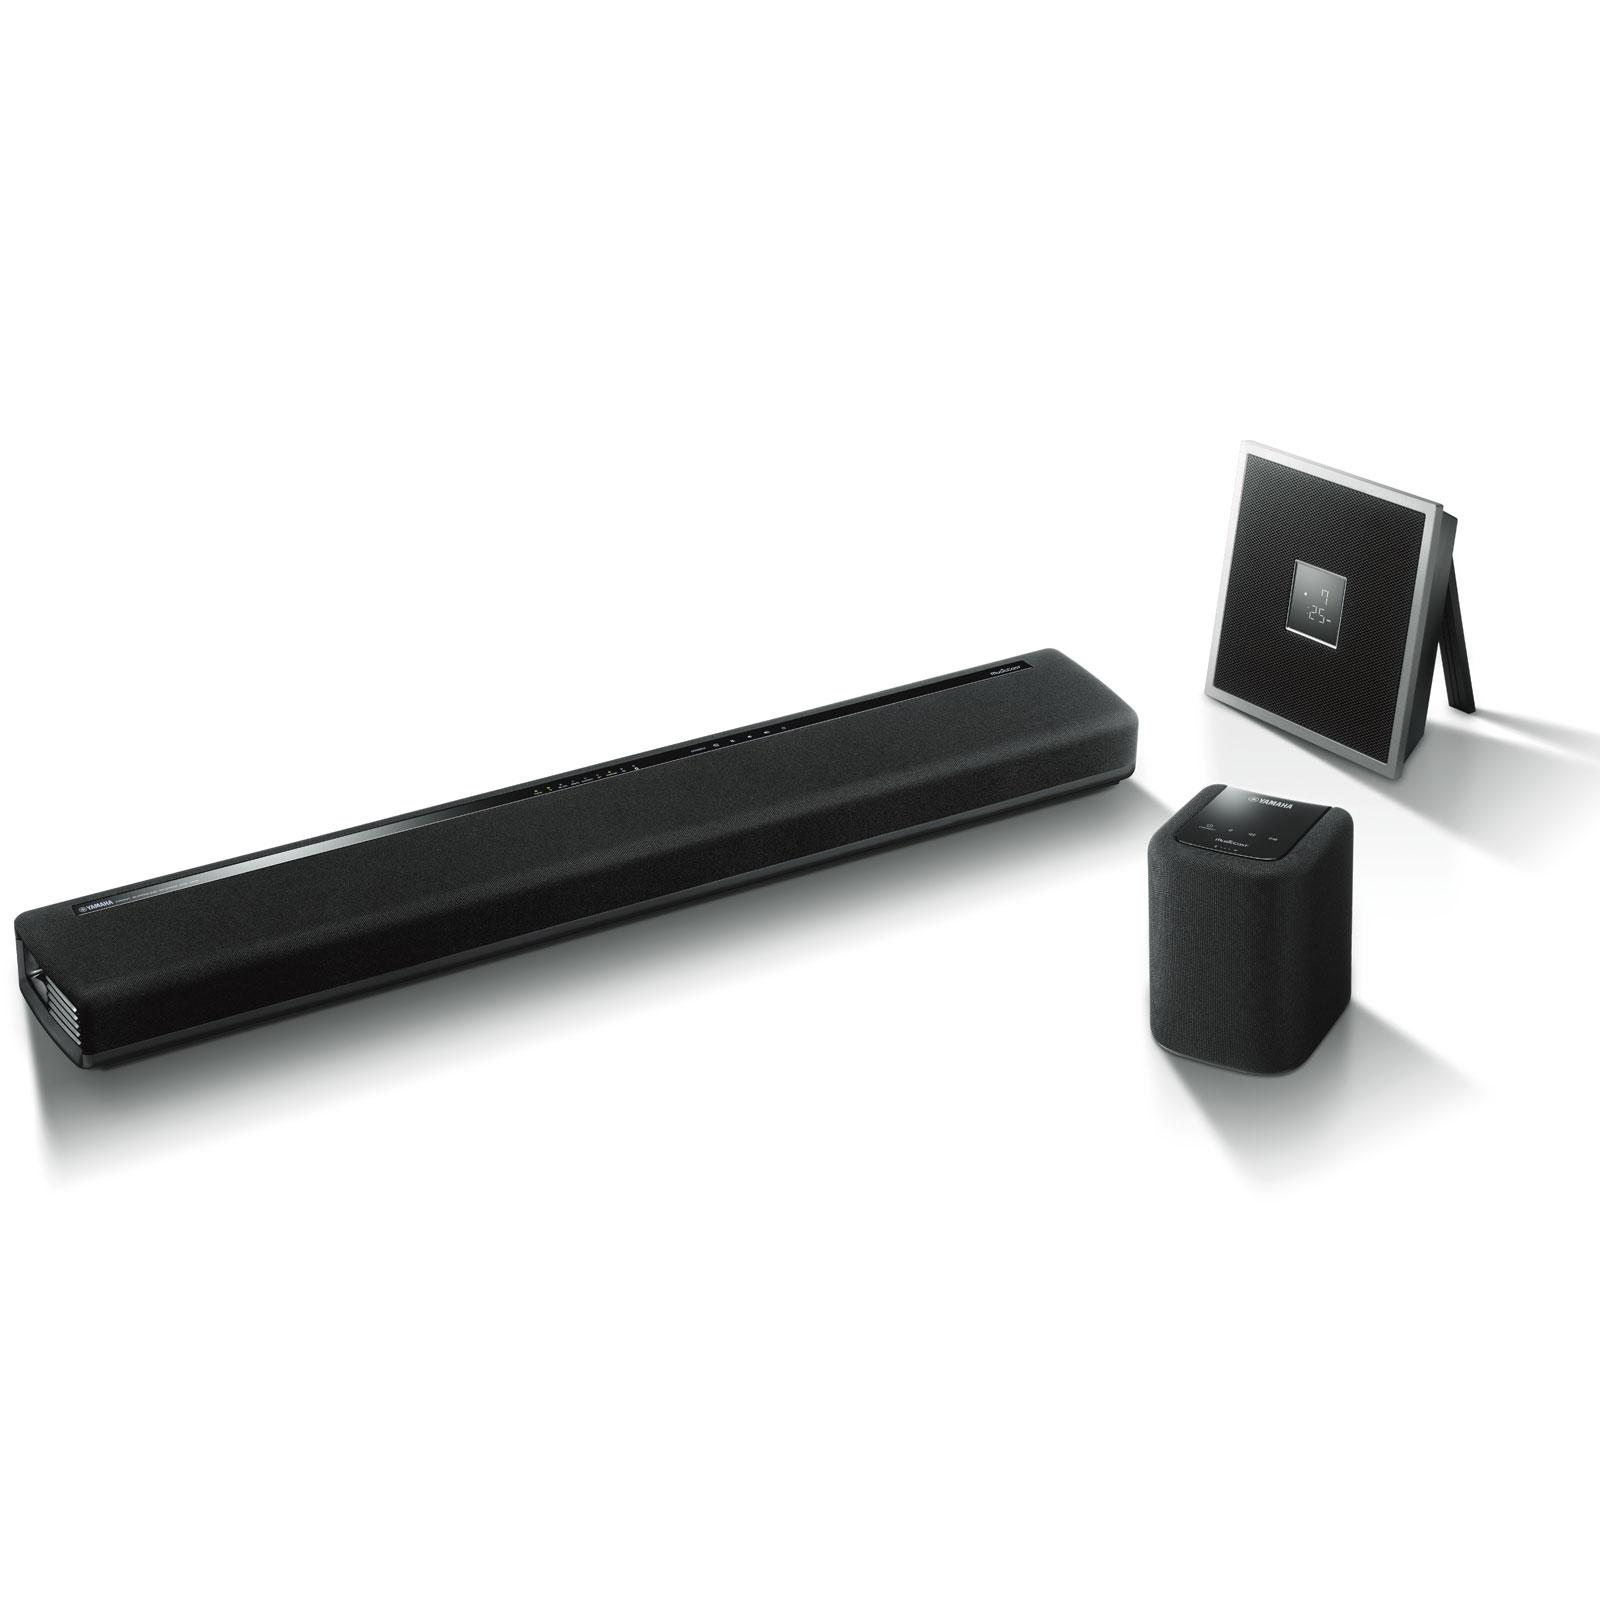 yamaha musiccast yas 306 noir barre de son yamaha sur. Black Bedroom Furniture Sets. Home Design Ideas